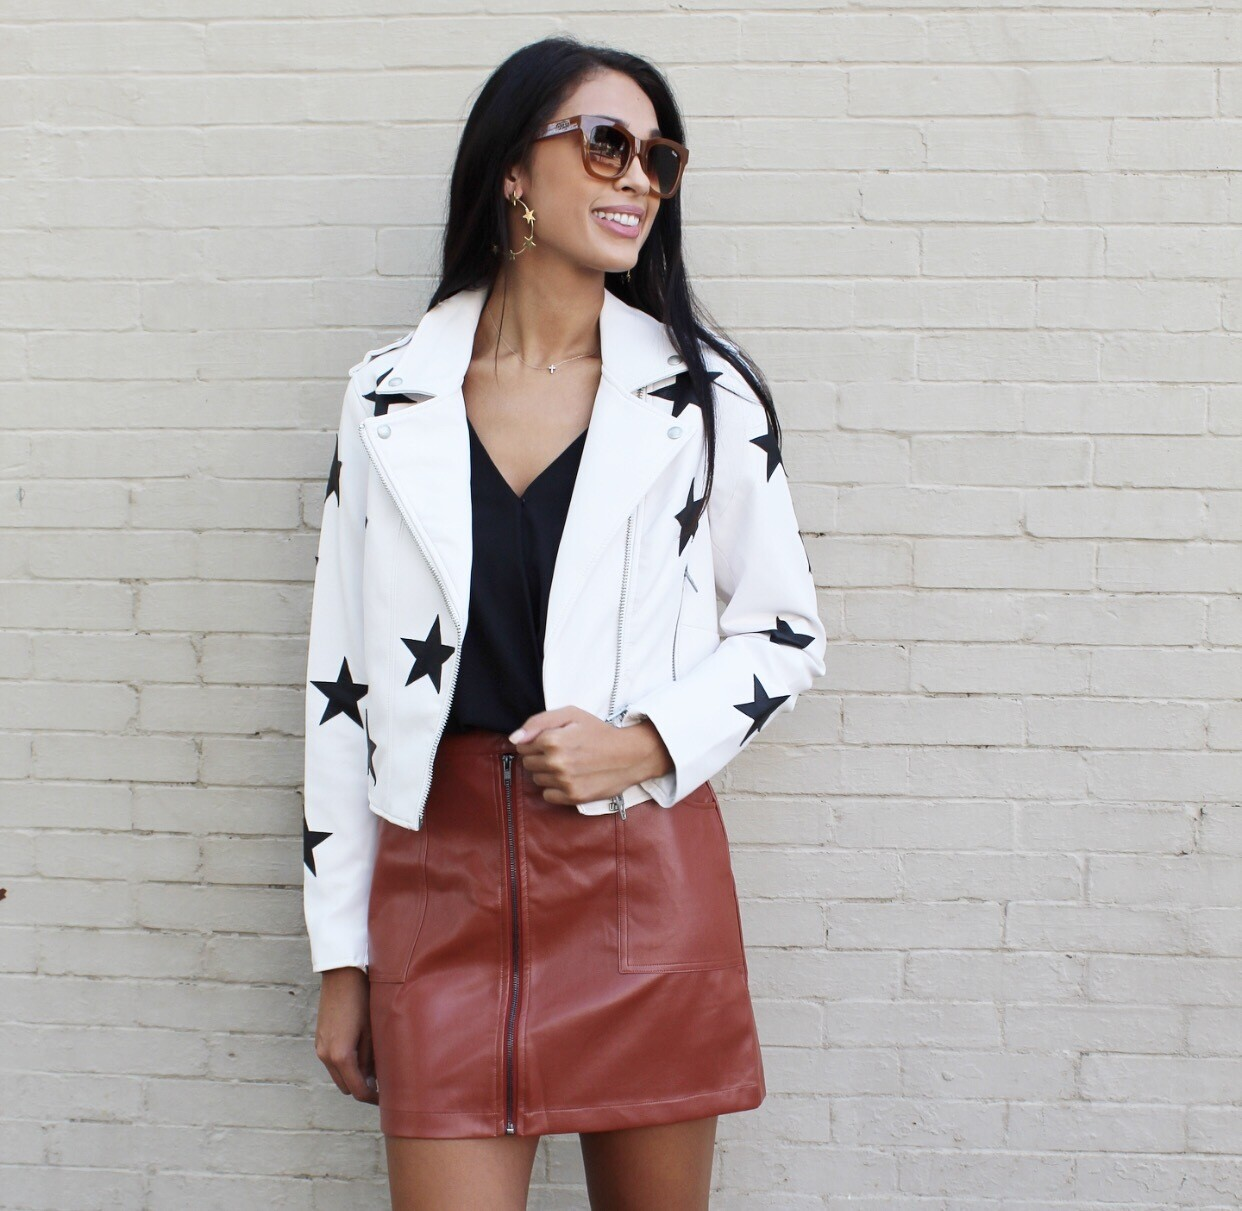 Superstar Blank NYC Jacket